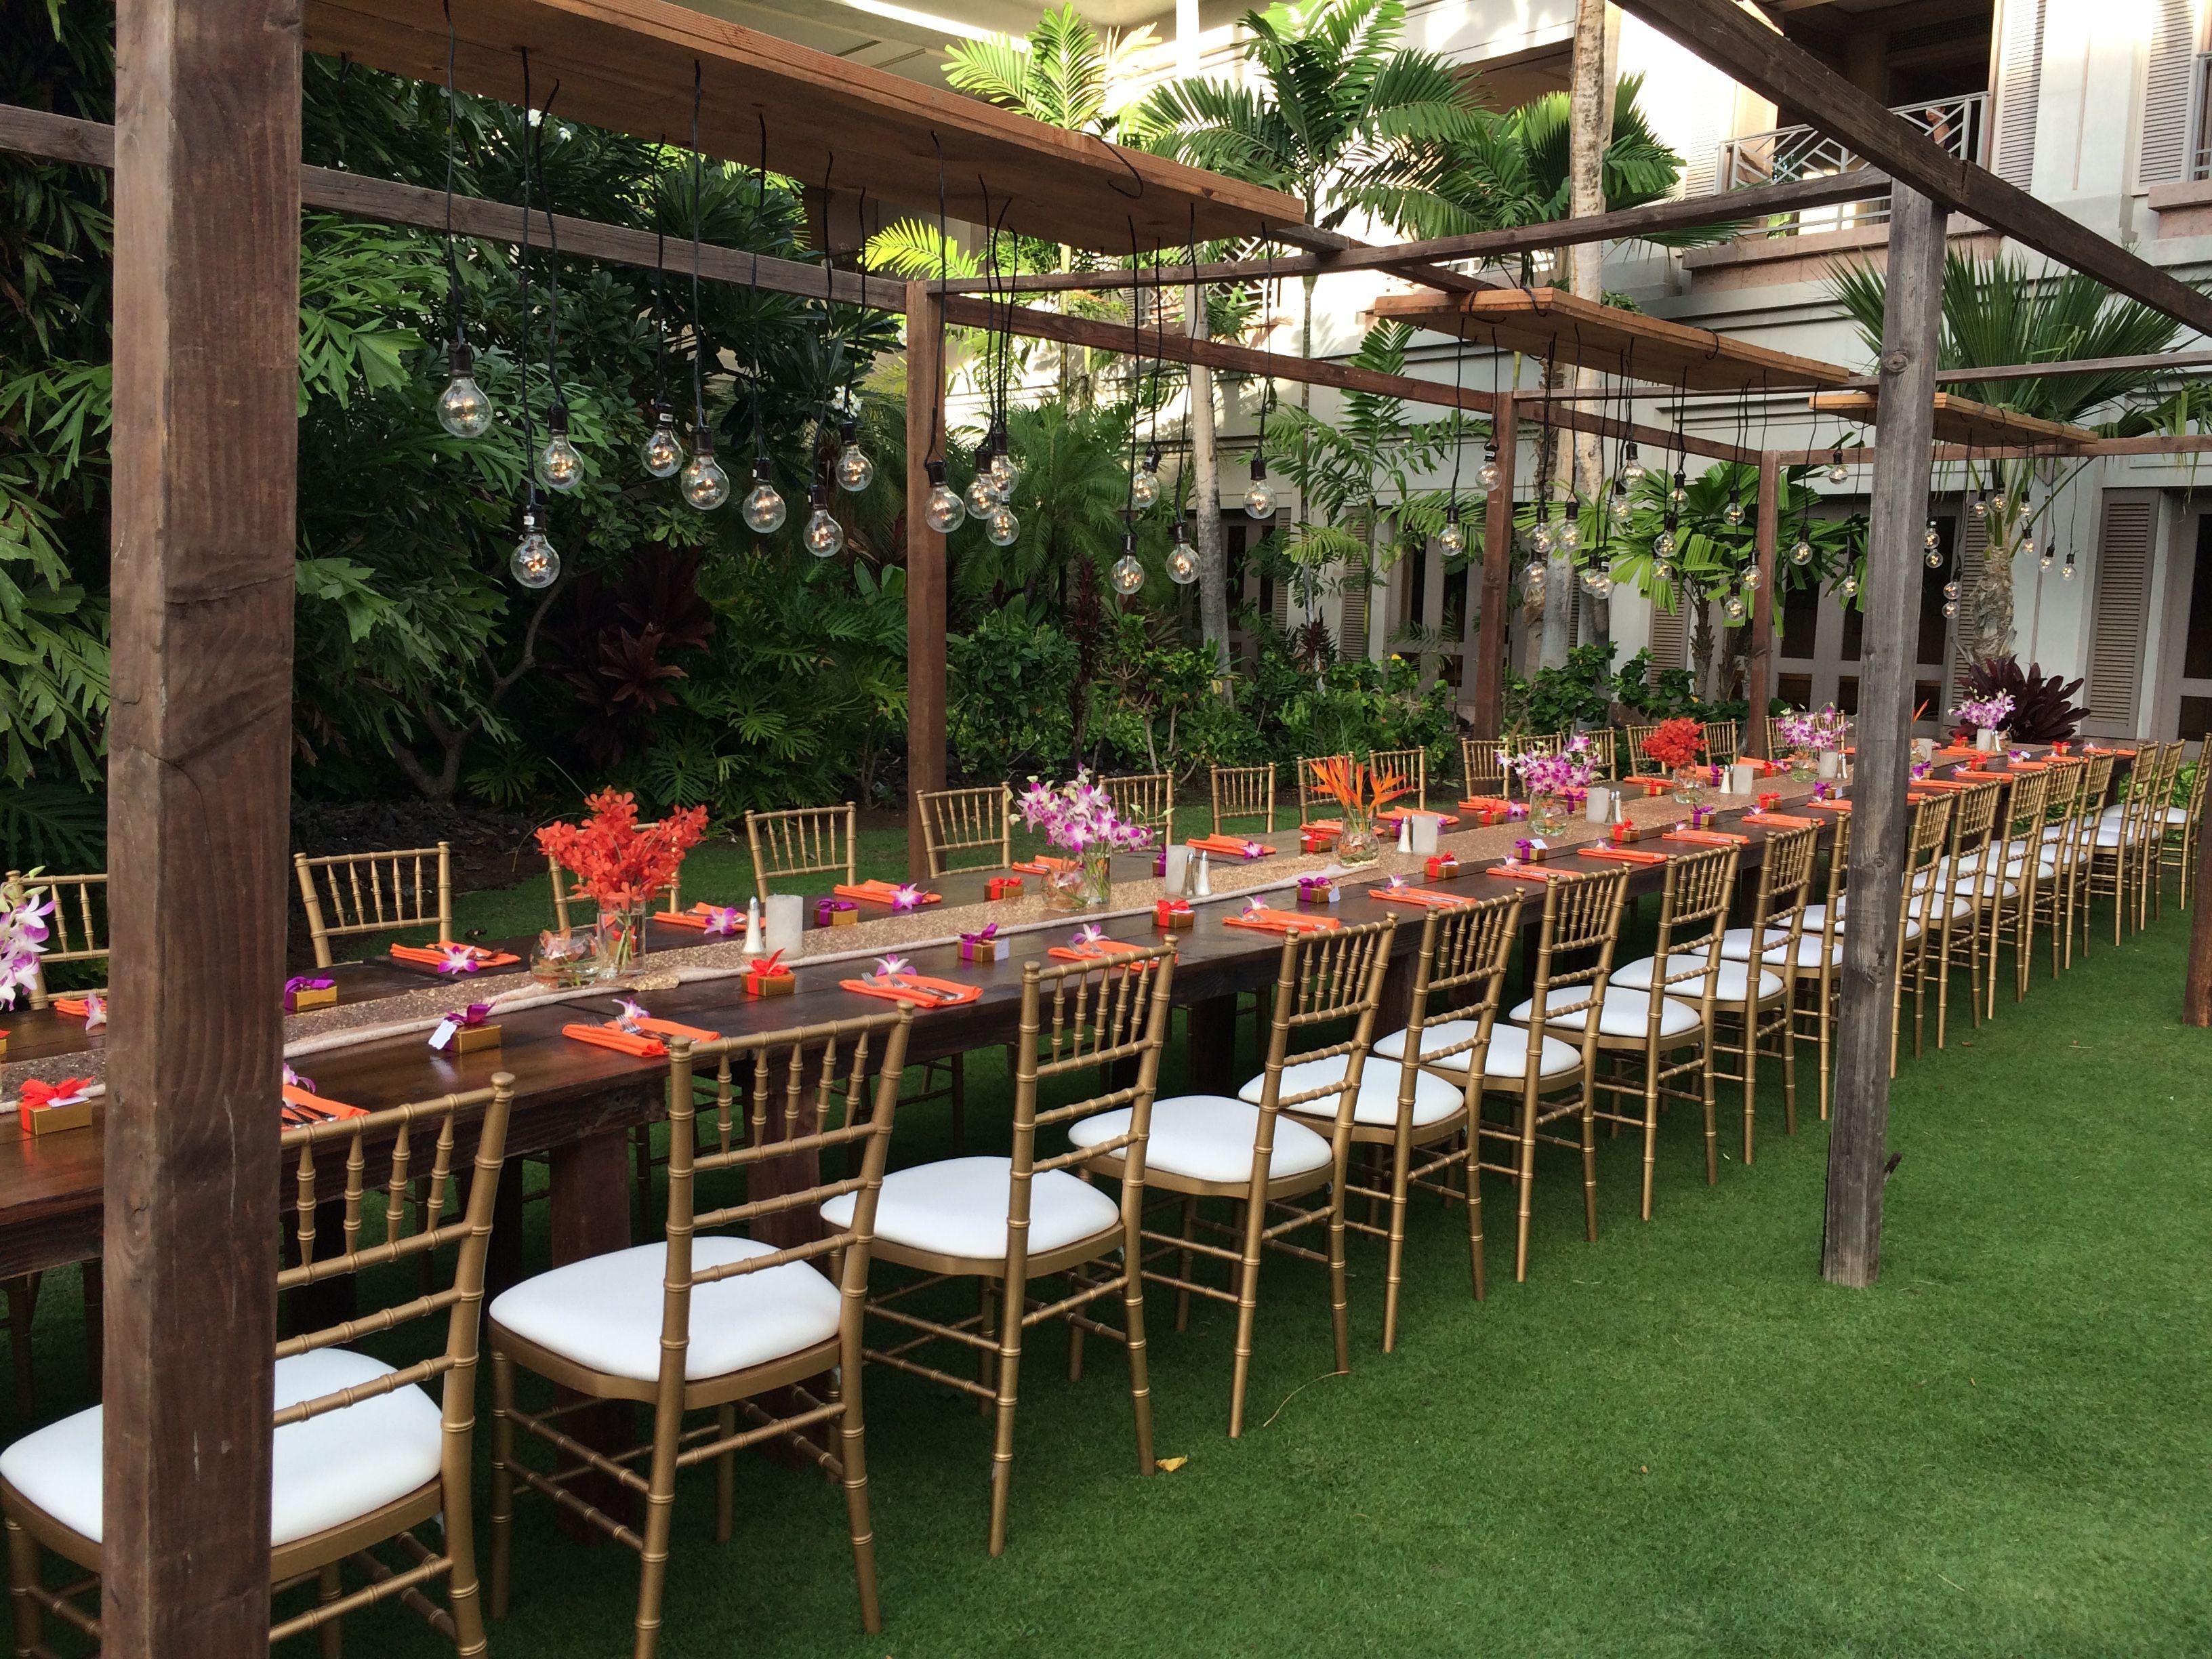 35+ Wedding venues in fairmont wv ideas